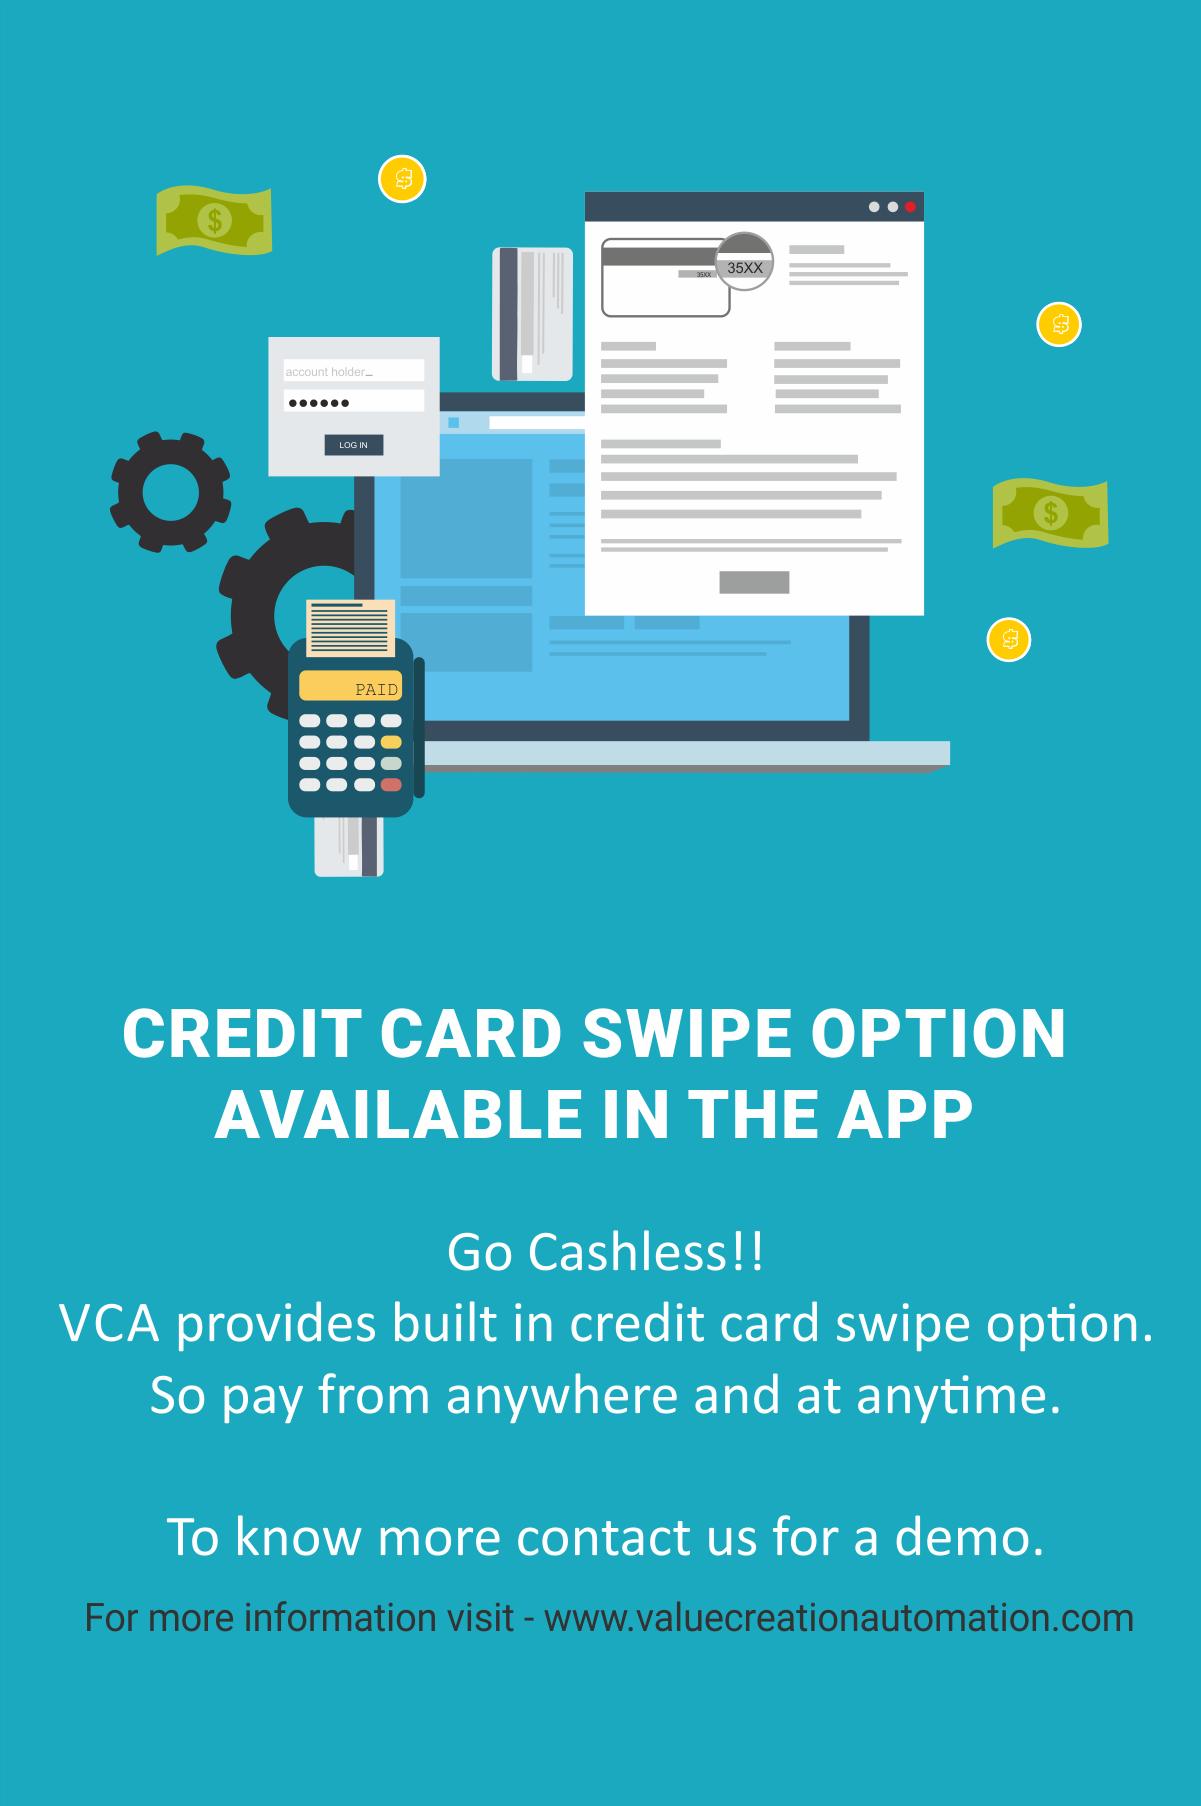 Go Cashless!! VCA provides built in credit card swipe